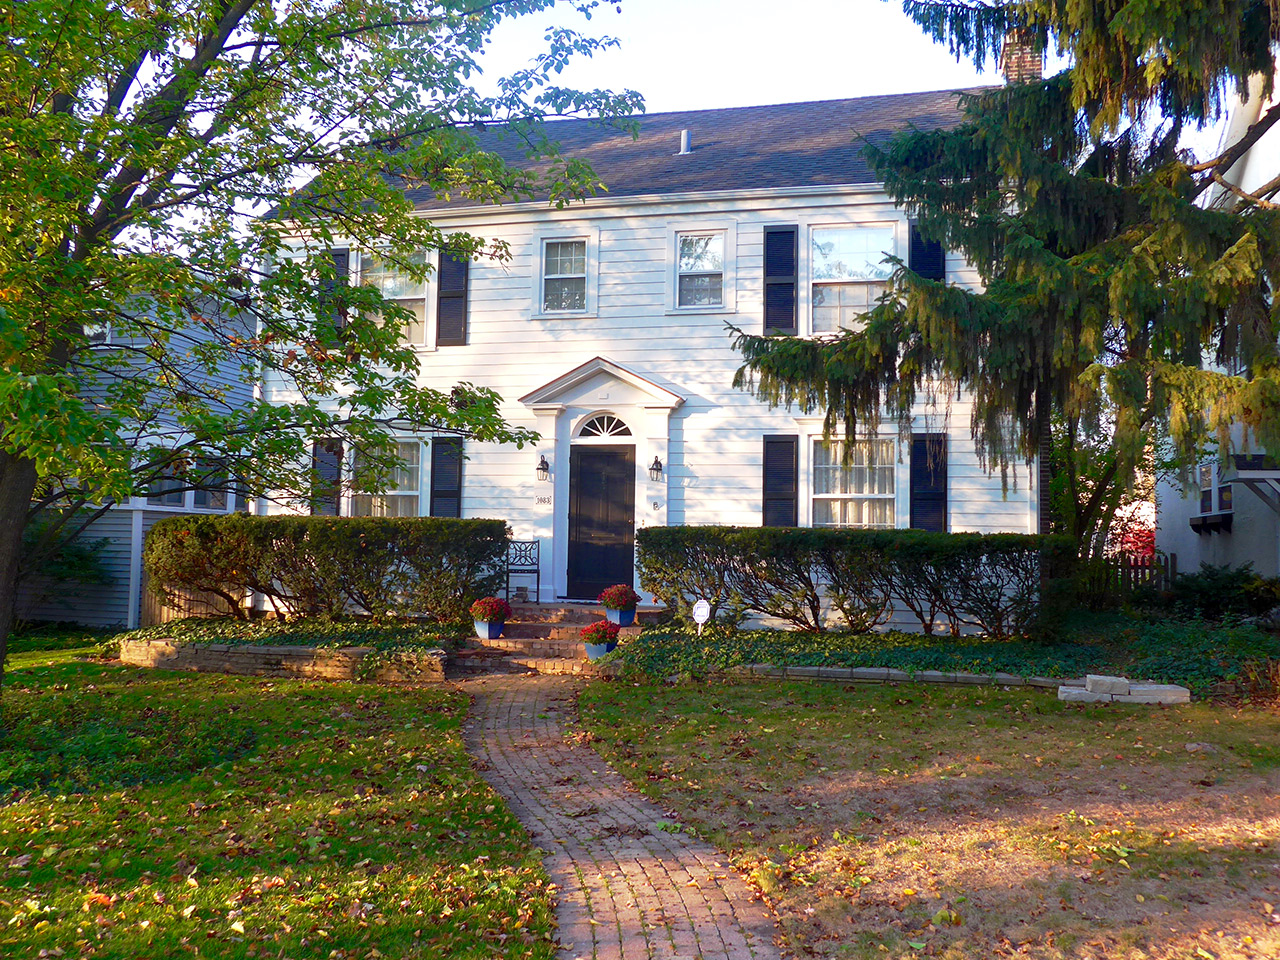 Winnetka-preservation-award-winning-Home-Transformation-after